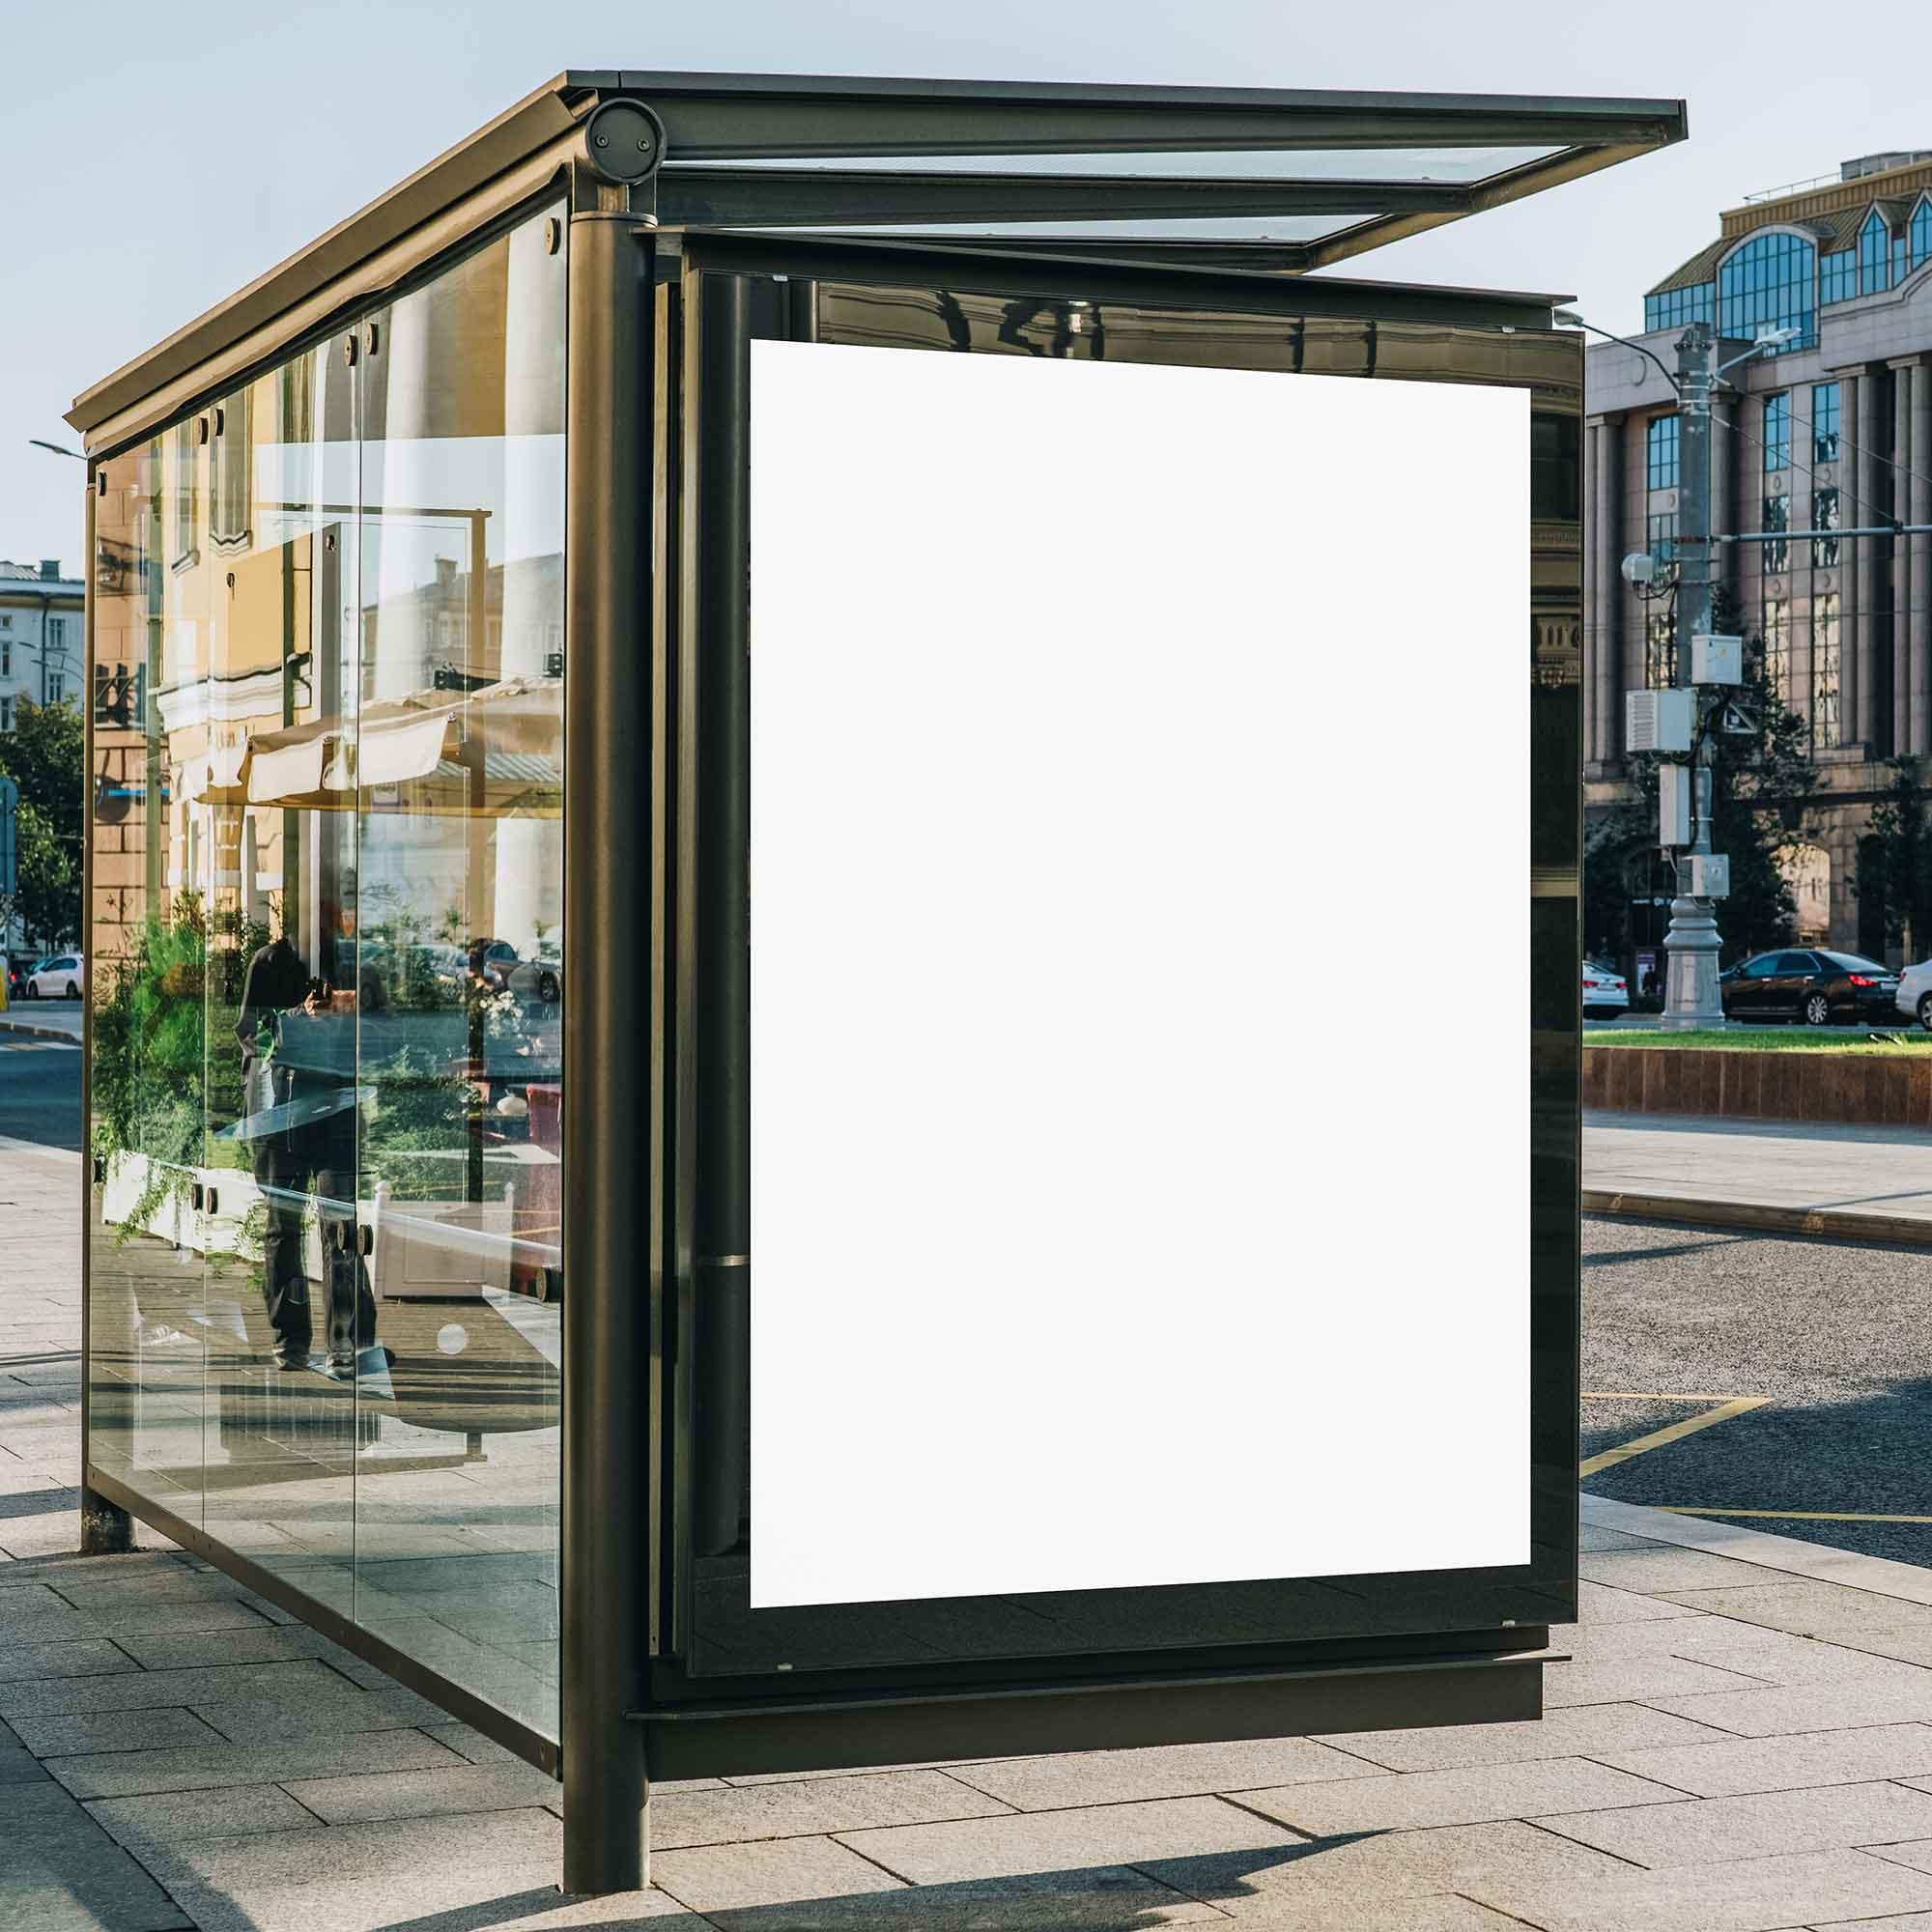 Outdoor Bus Shelter Advertisement Mockup 2